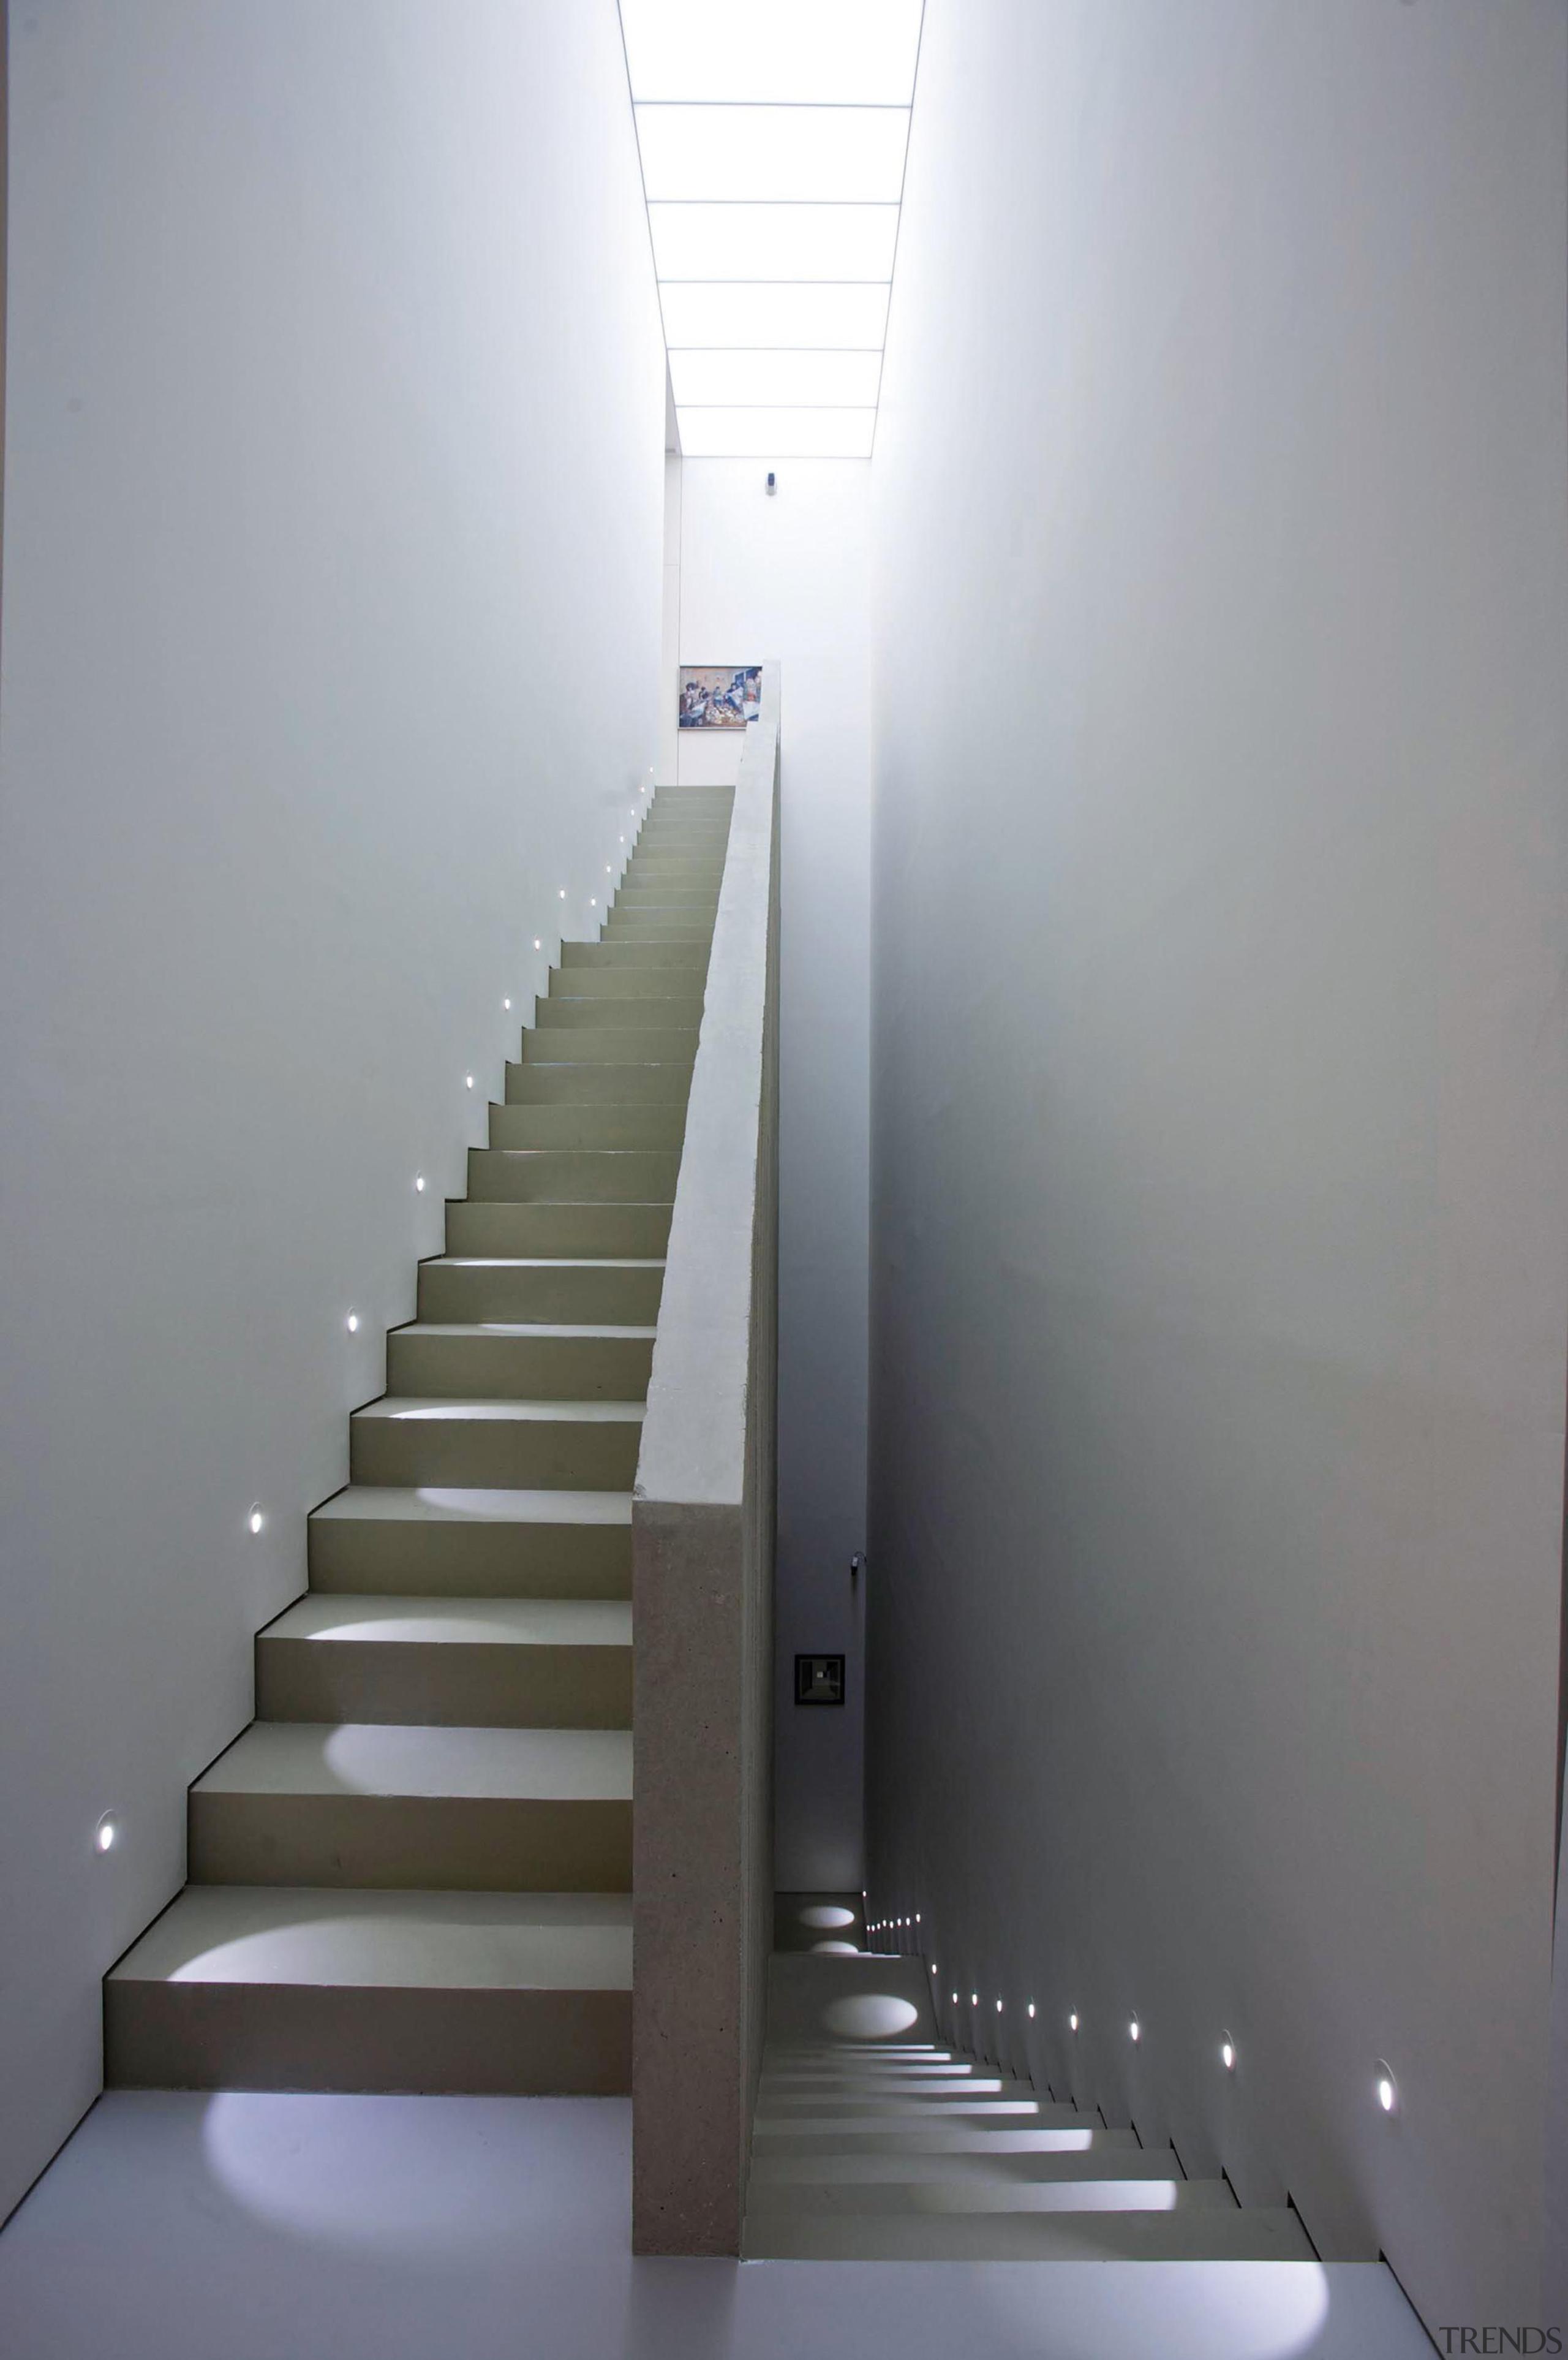 LED Lights - architecture   daylighting   product architecture, daylighting, product design, stairs, gray